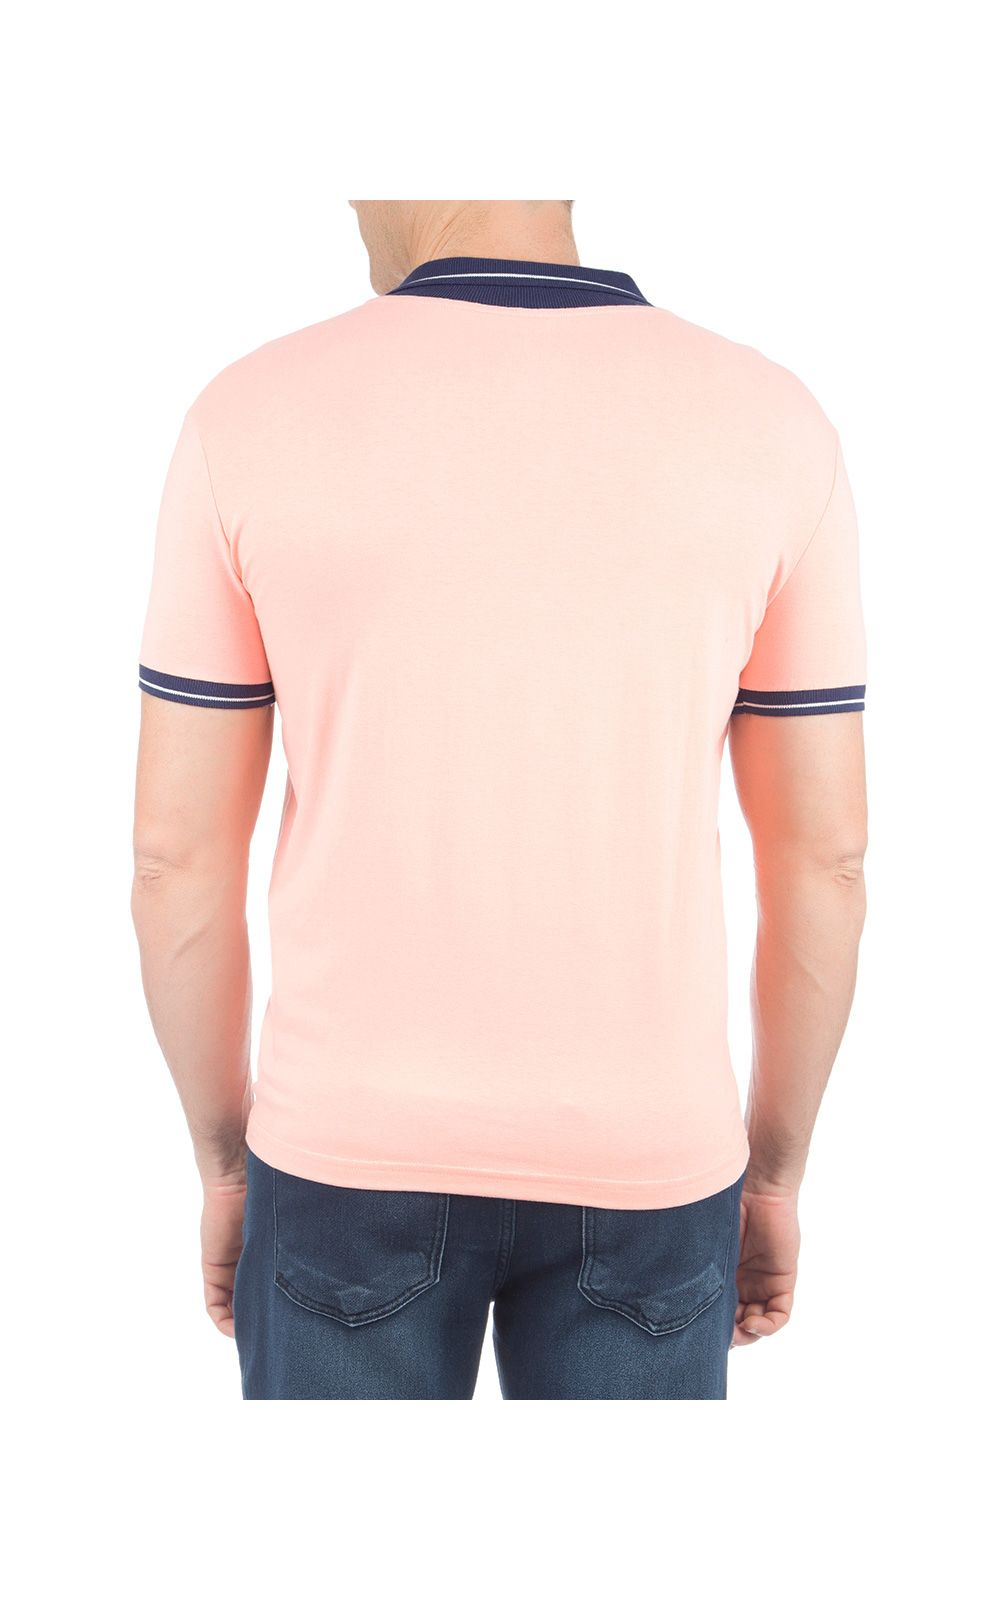 Foto 2 - Camisa Polo Masculina Laranja Detalhada